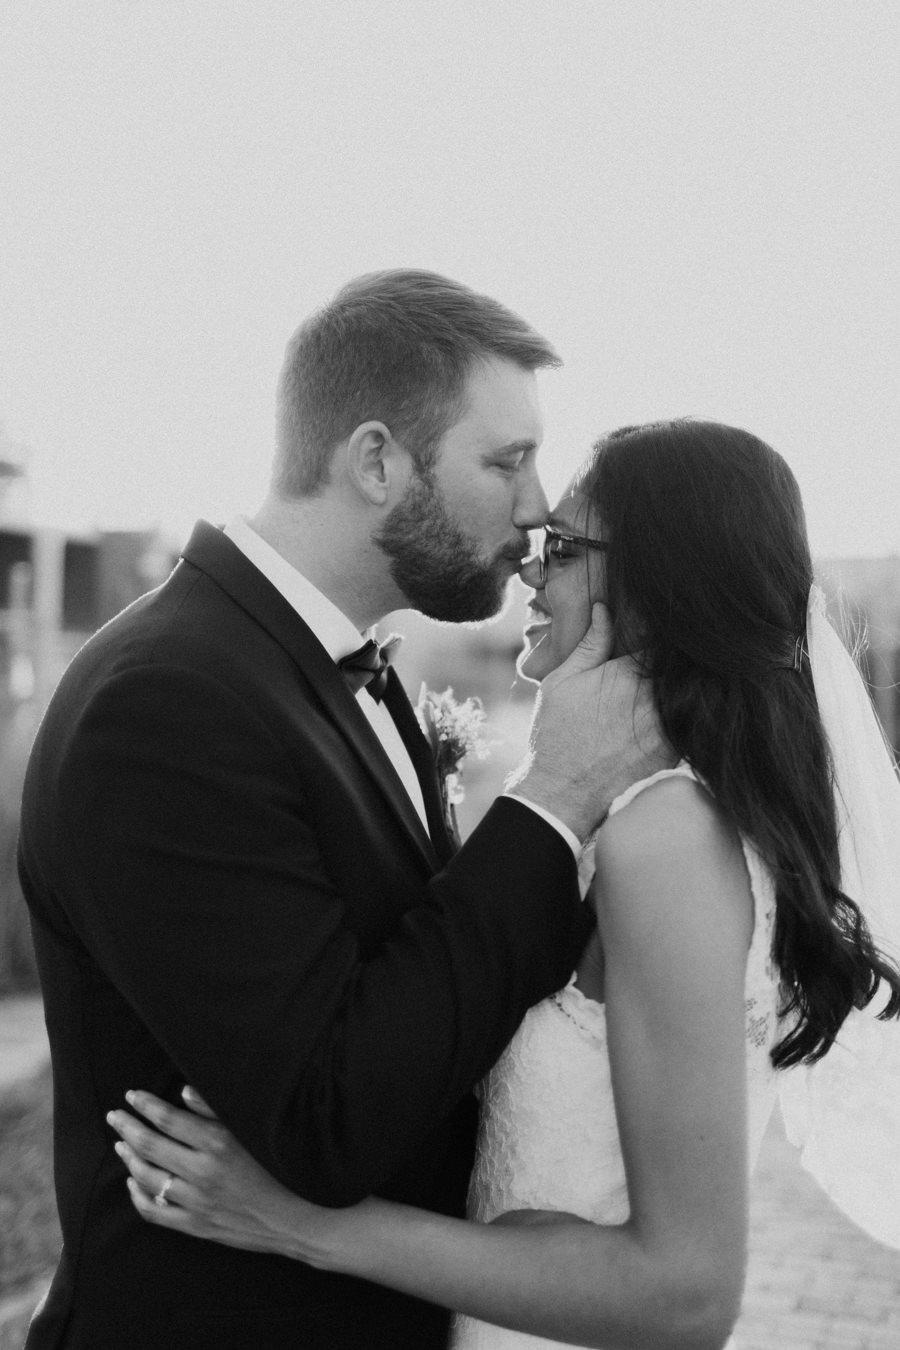 Tampa Heights Industrial Wedding at Cavu Emmy RJ-161.jpg